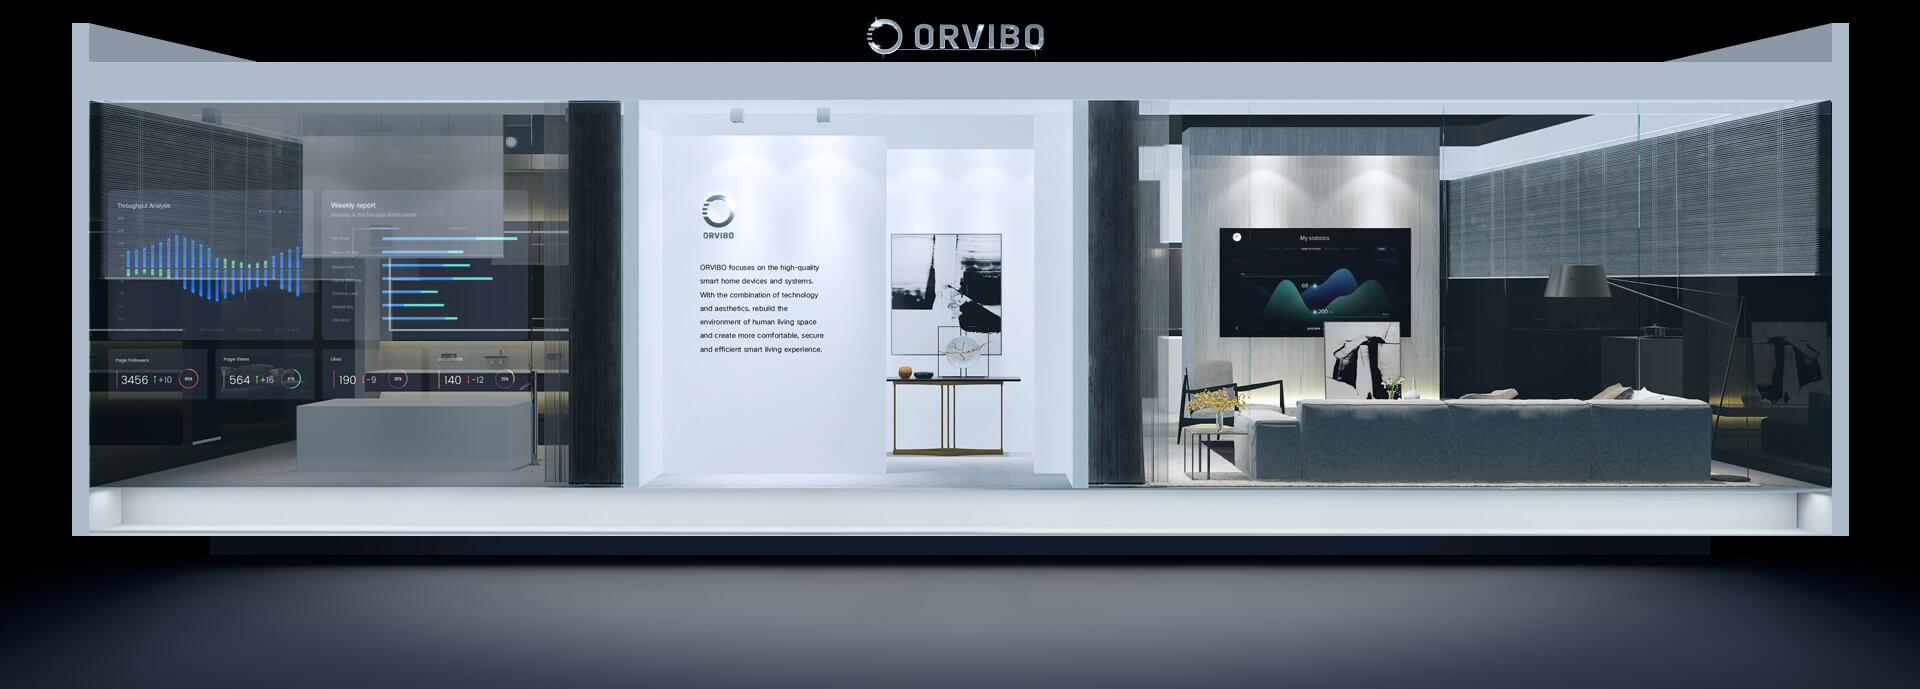 ORVIBO- Your Smart Home